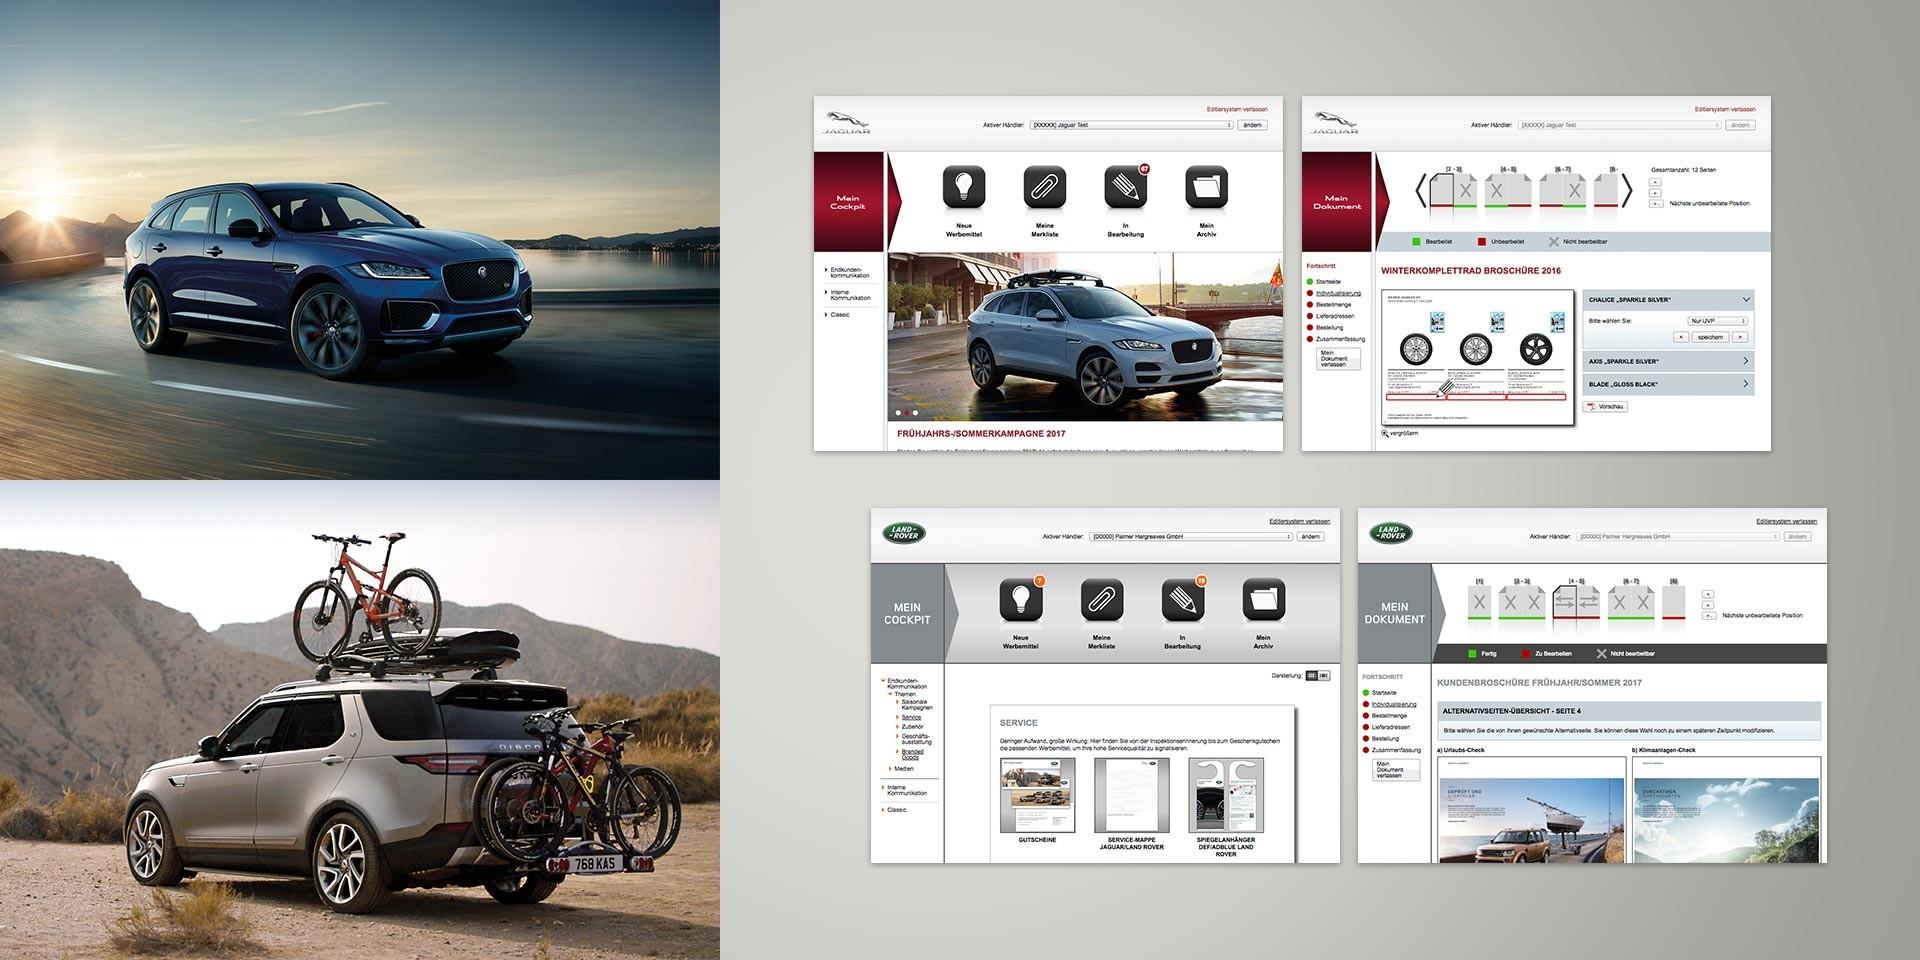 Jaguar Land Rover – Händlerportal – Editier-System